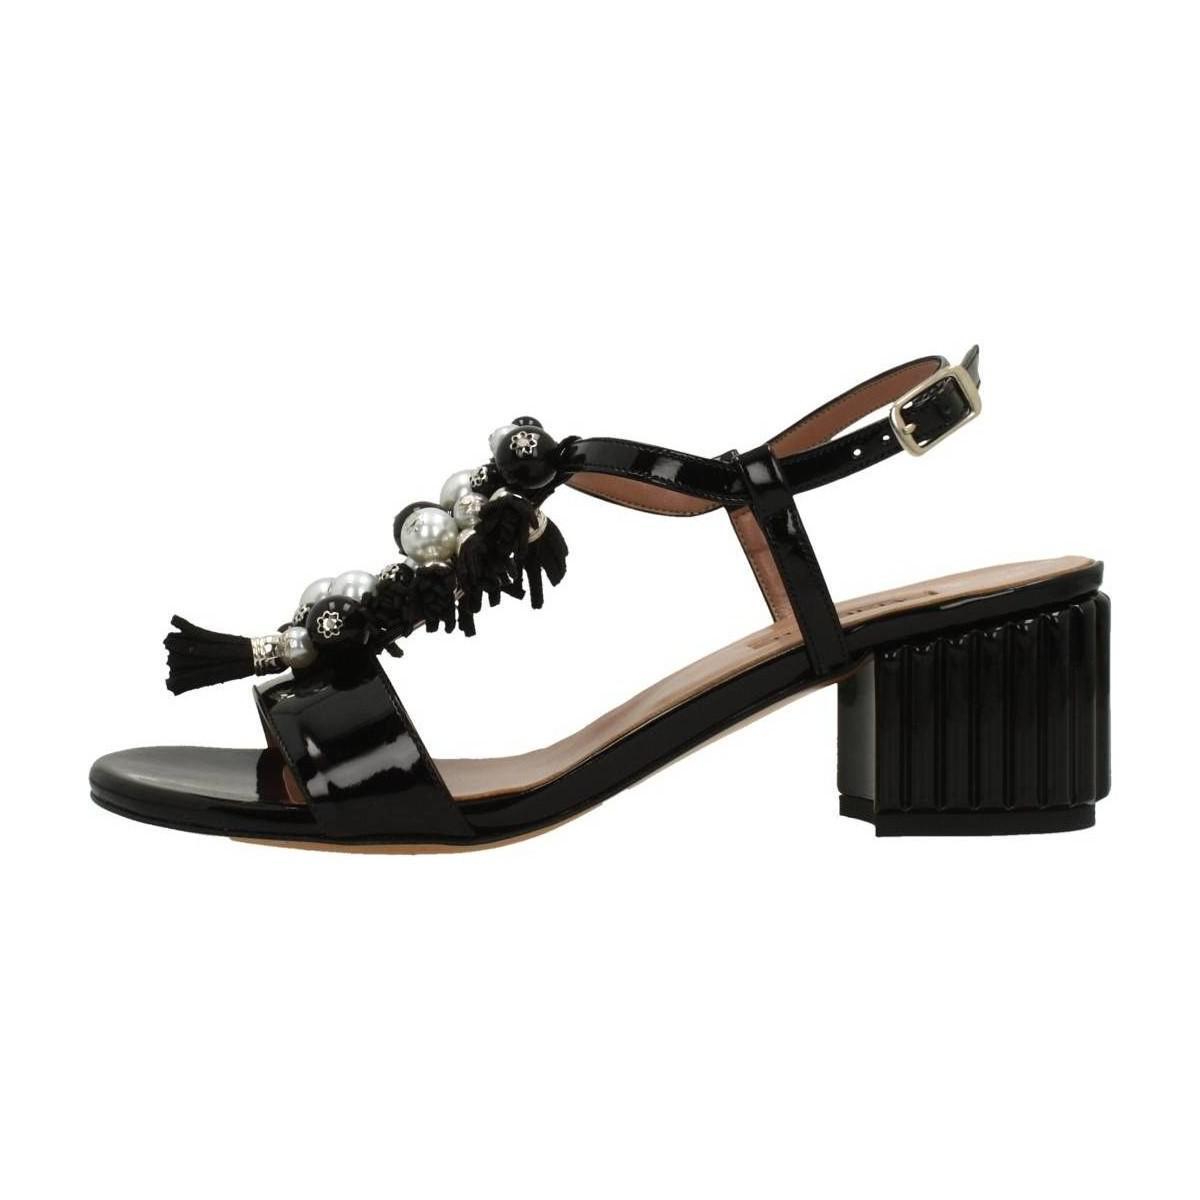 Albano 1738AL women's Sandals in Wholesale Price Top Quality Cheap Online 100% Authentic Online Official Site Sale Online qExGQx